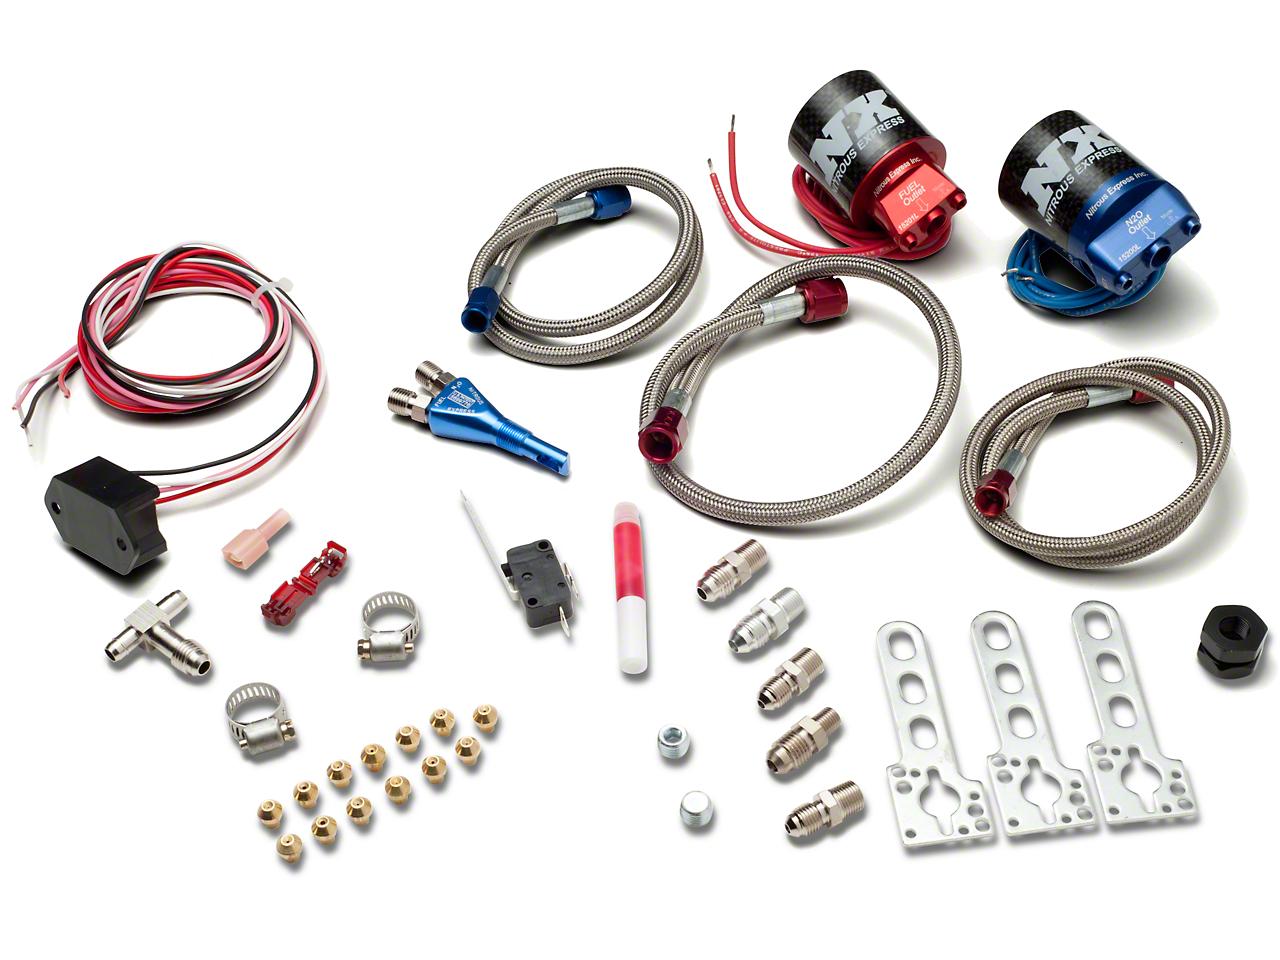 Nitrous Express Nitrous Kit - Nozzle System (05-10 GT)